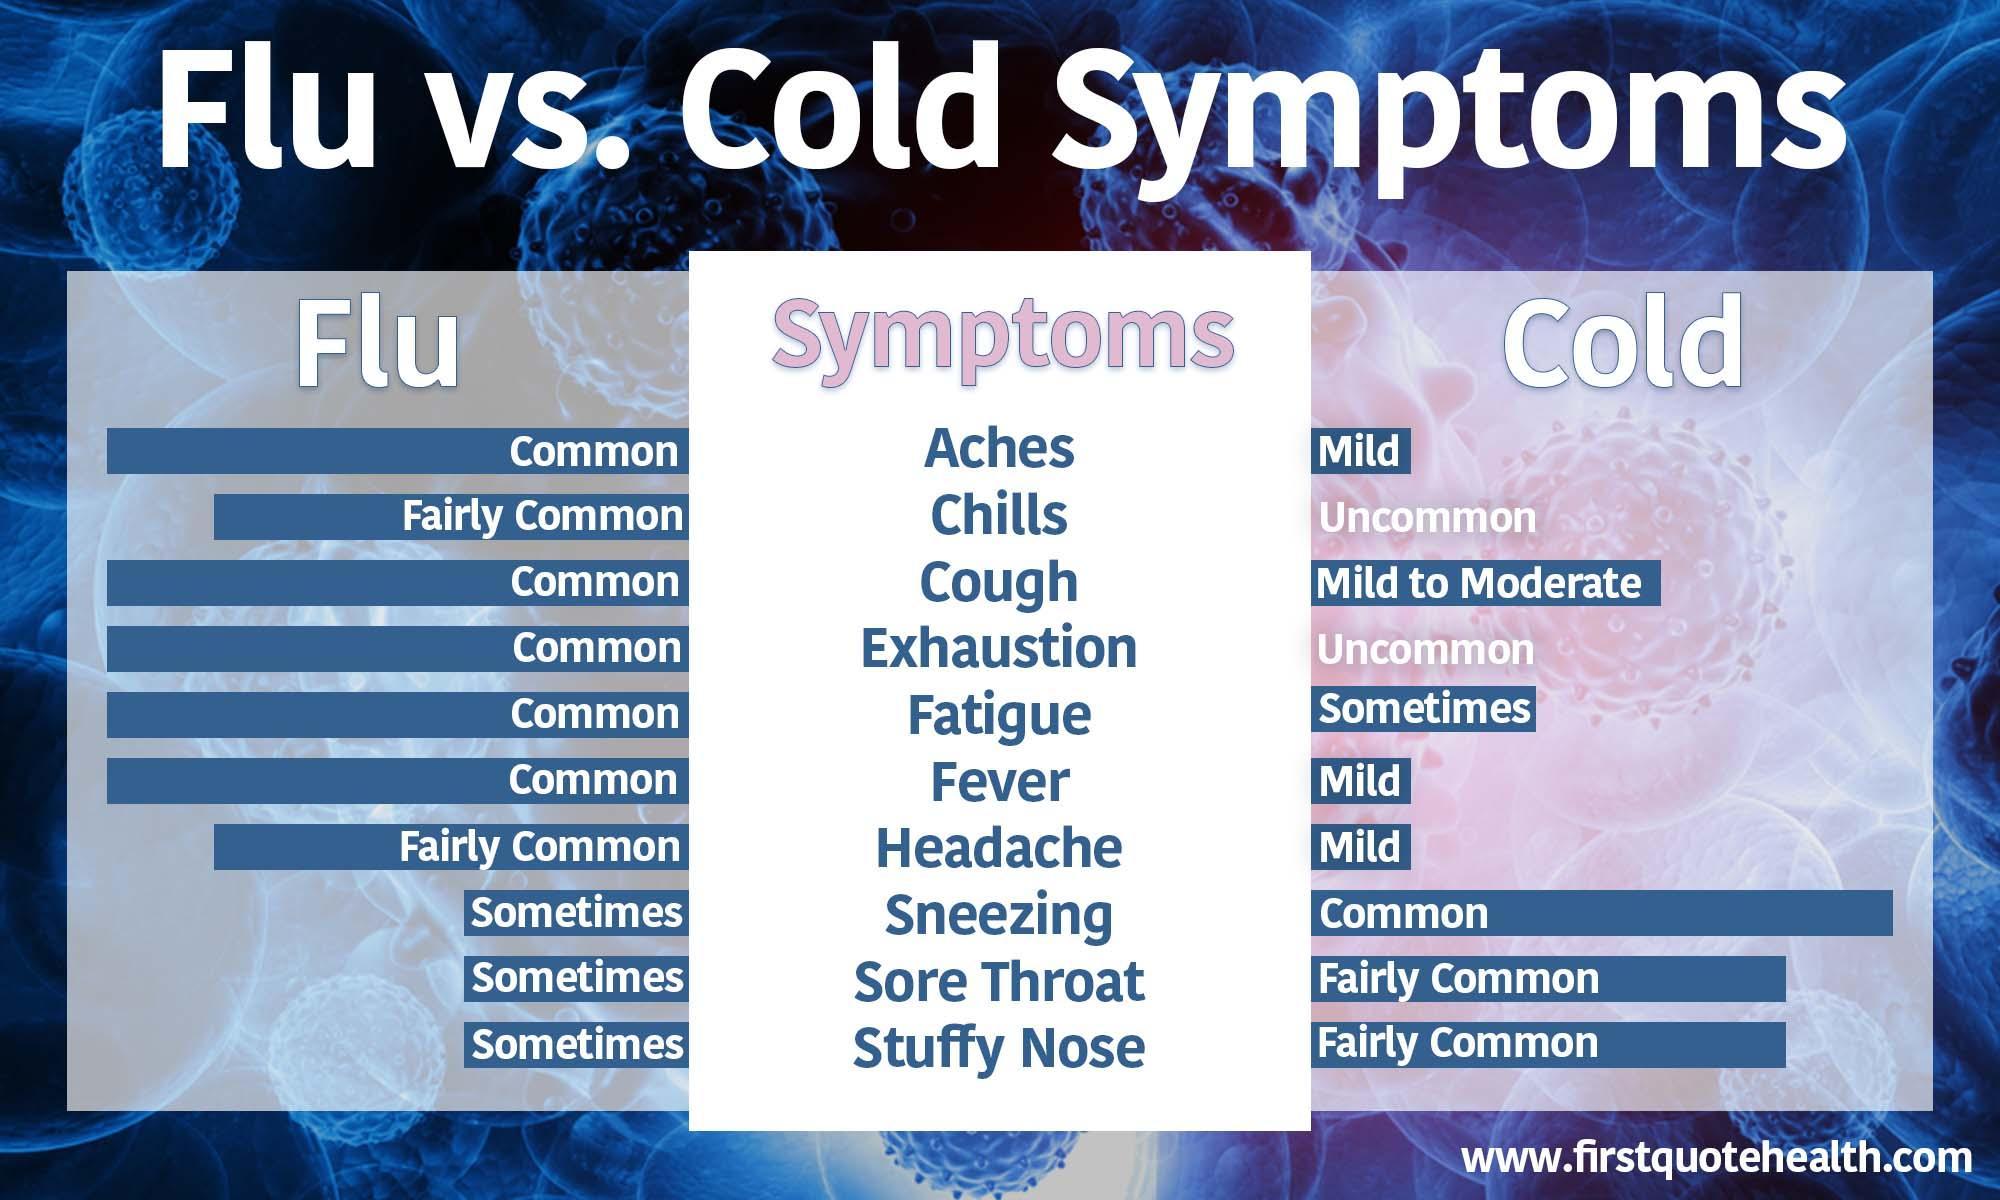 flu vs cold symptoms infographic